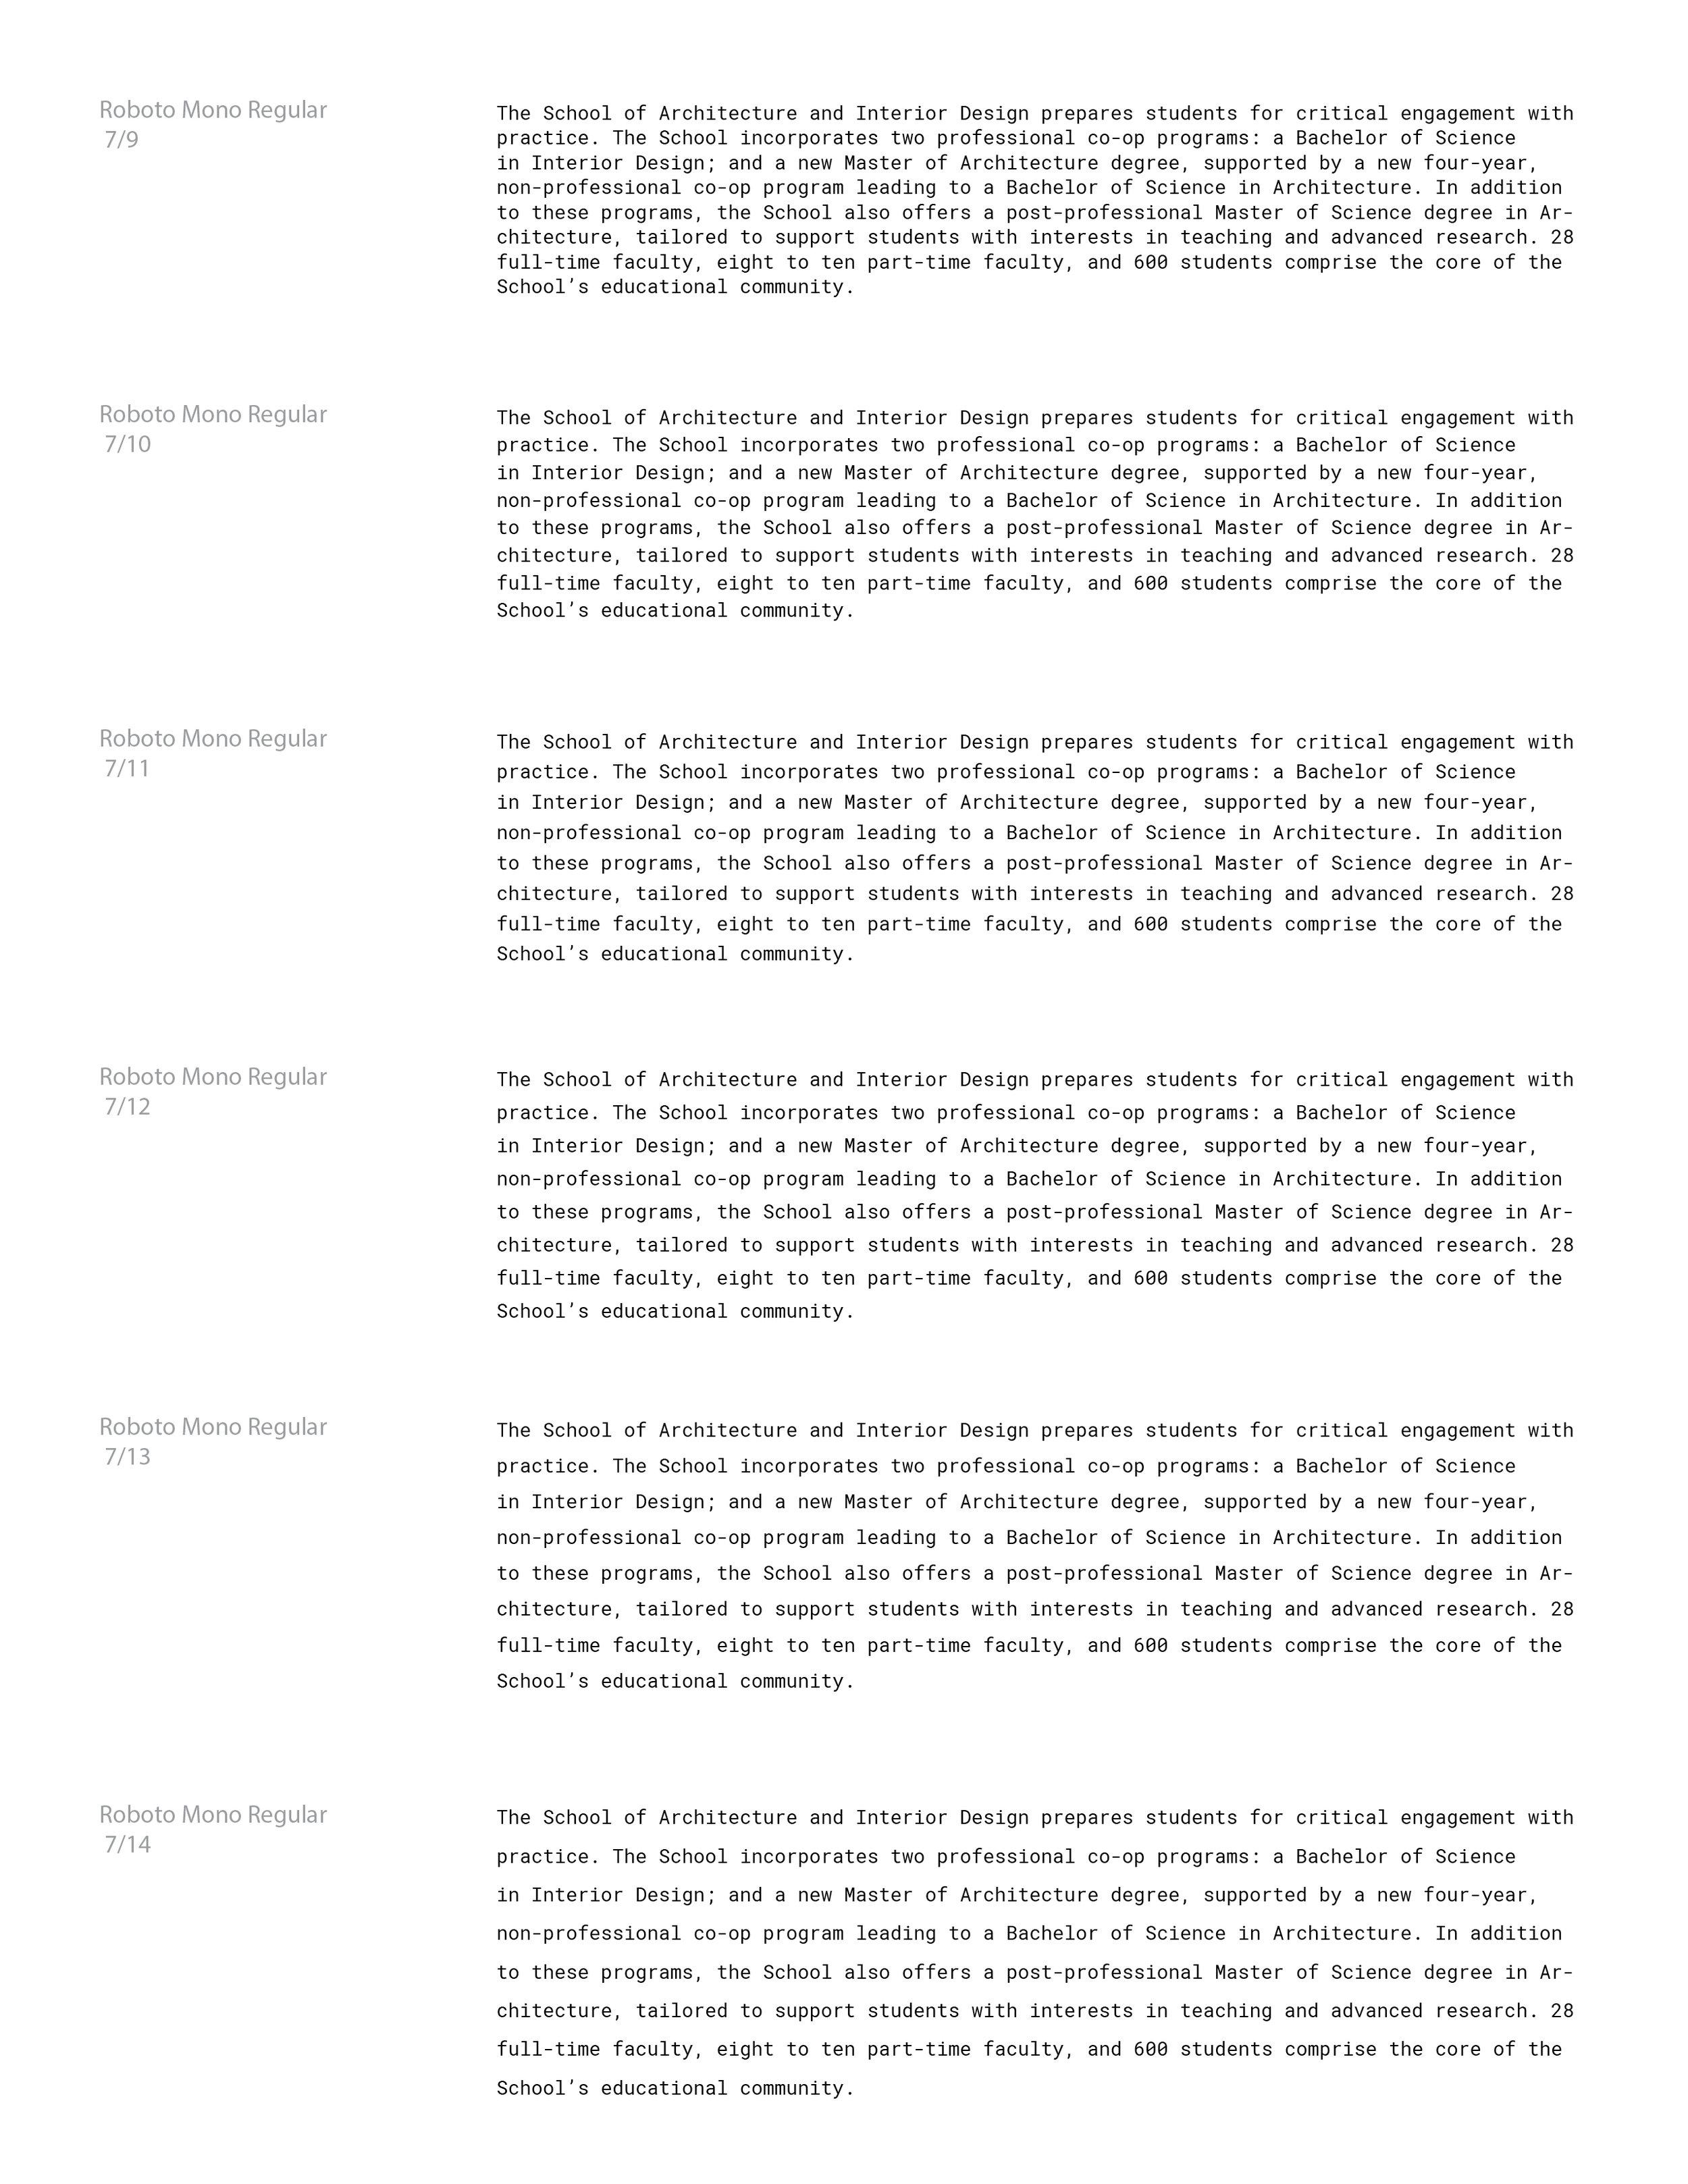 body-copy-explorations-.jpg